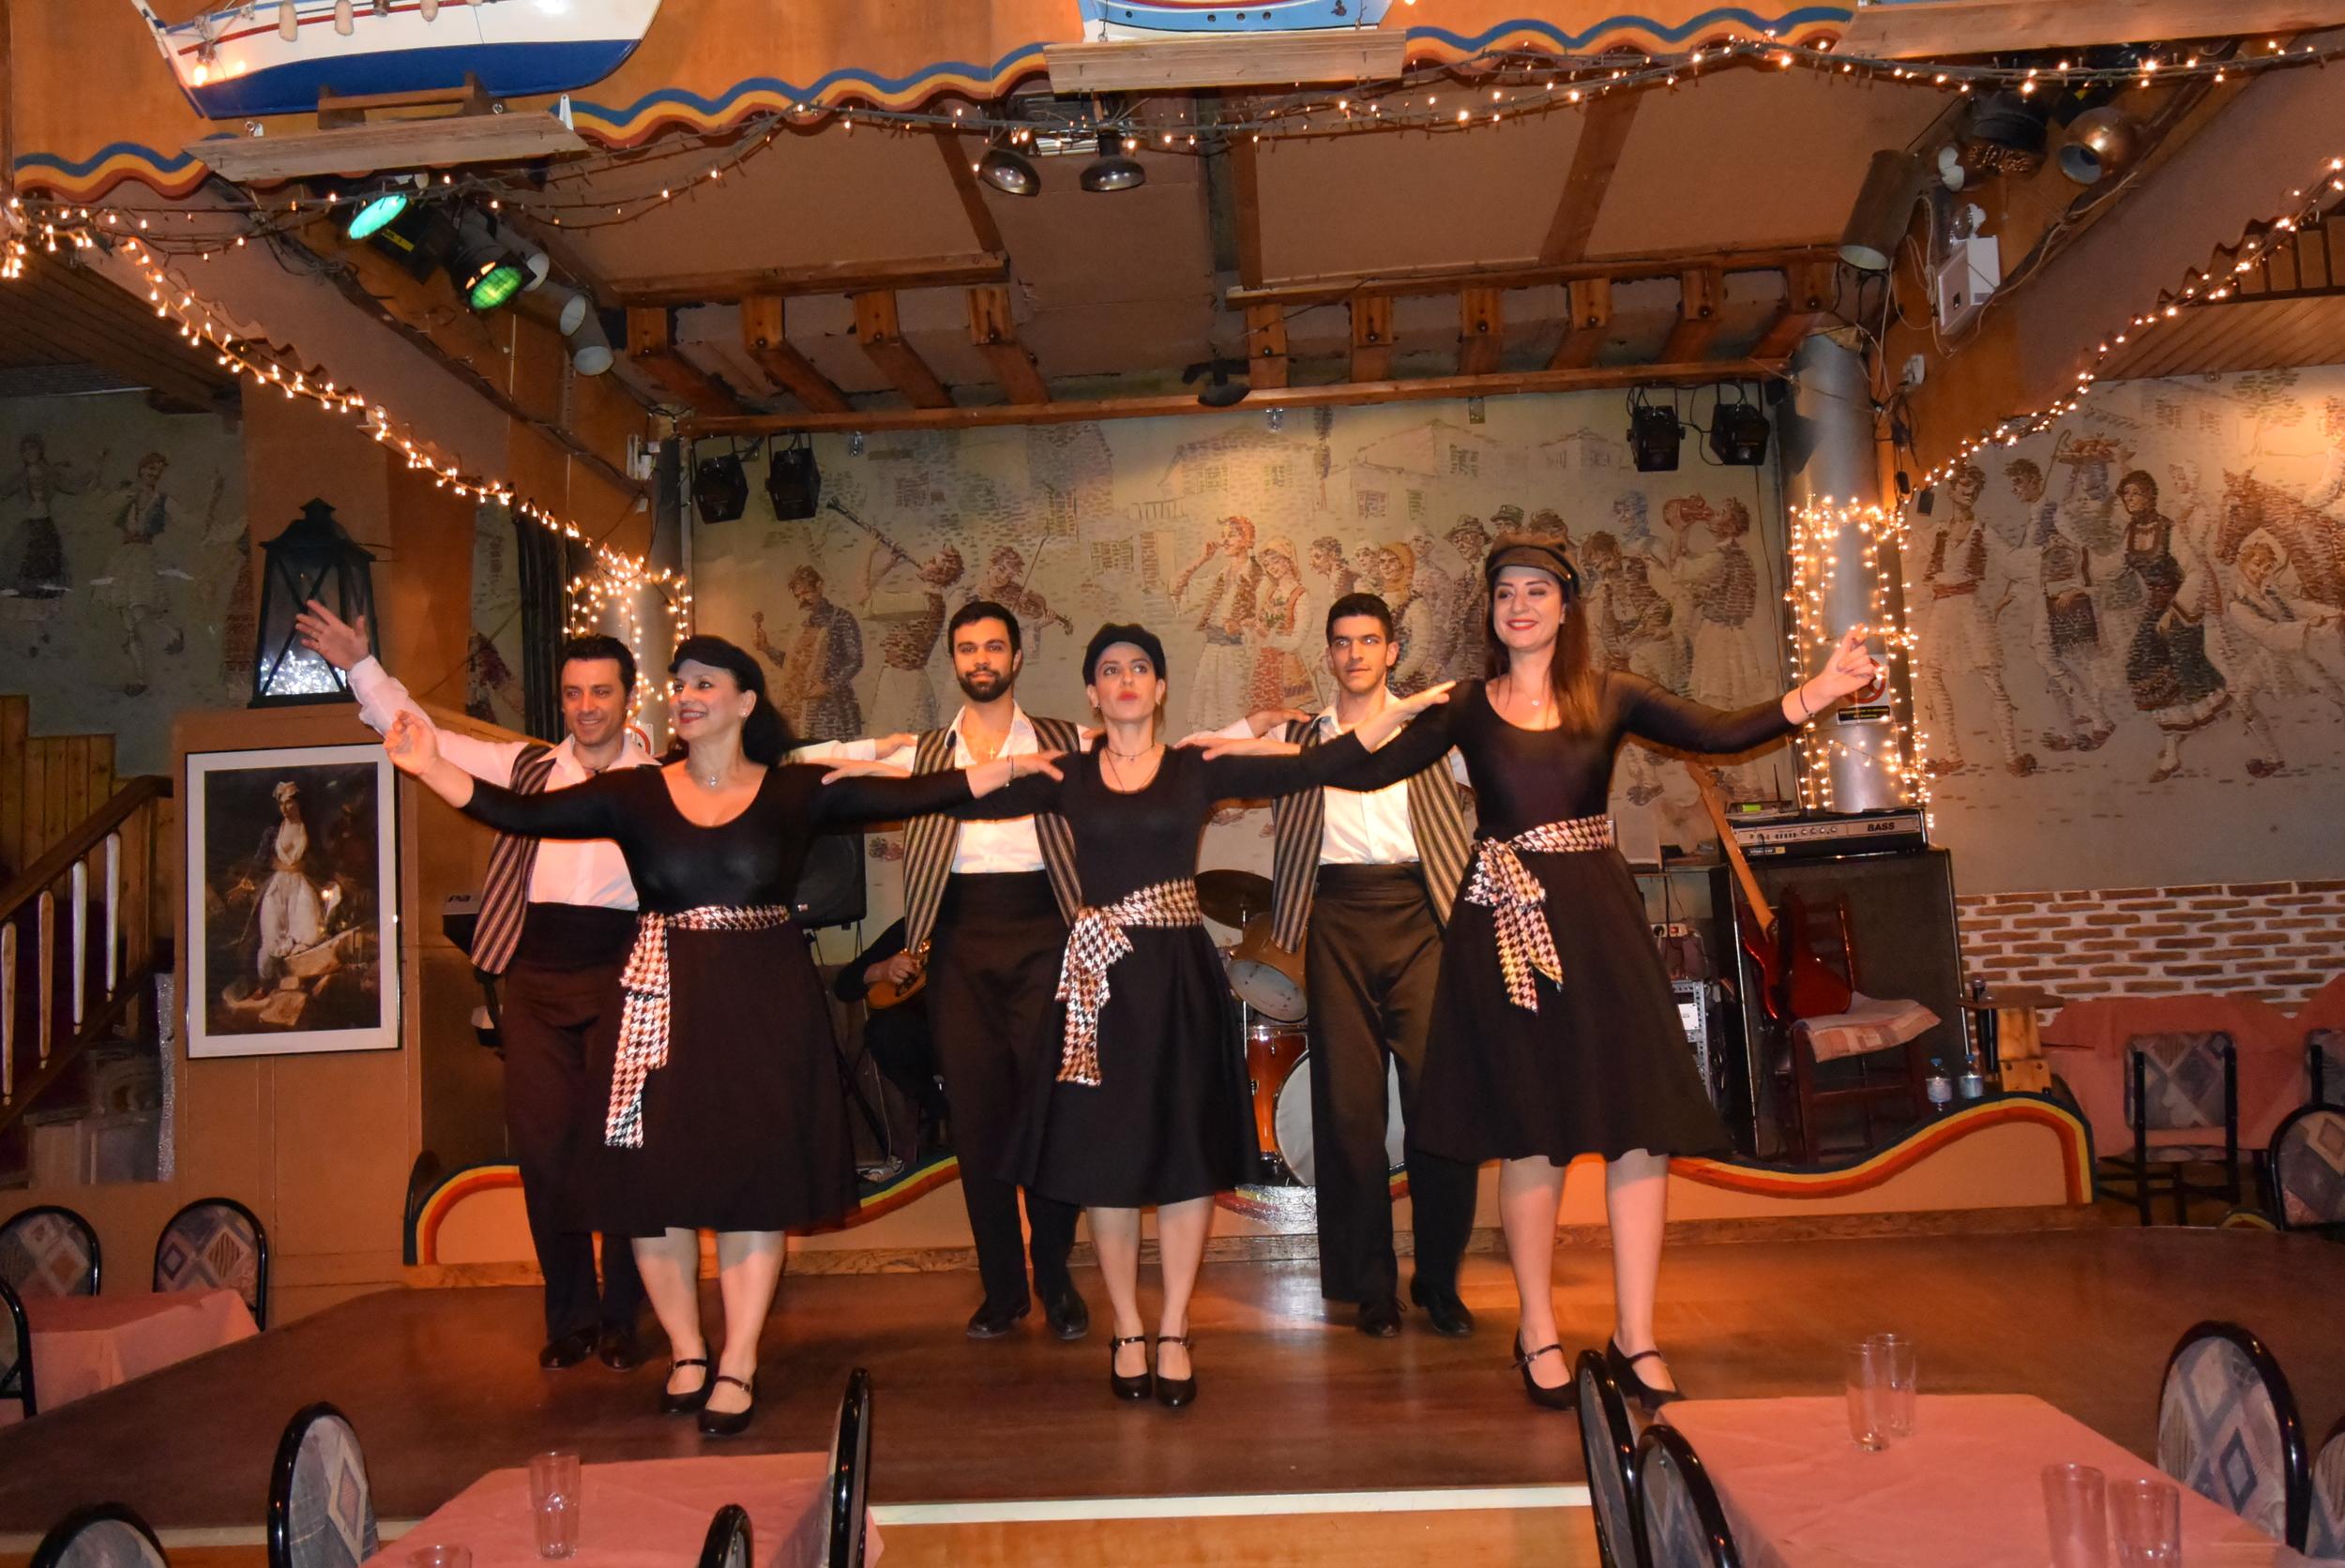 Chasapiko danced by women